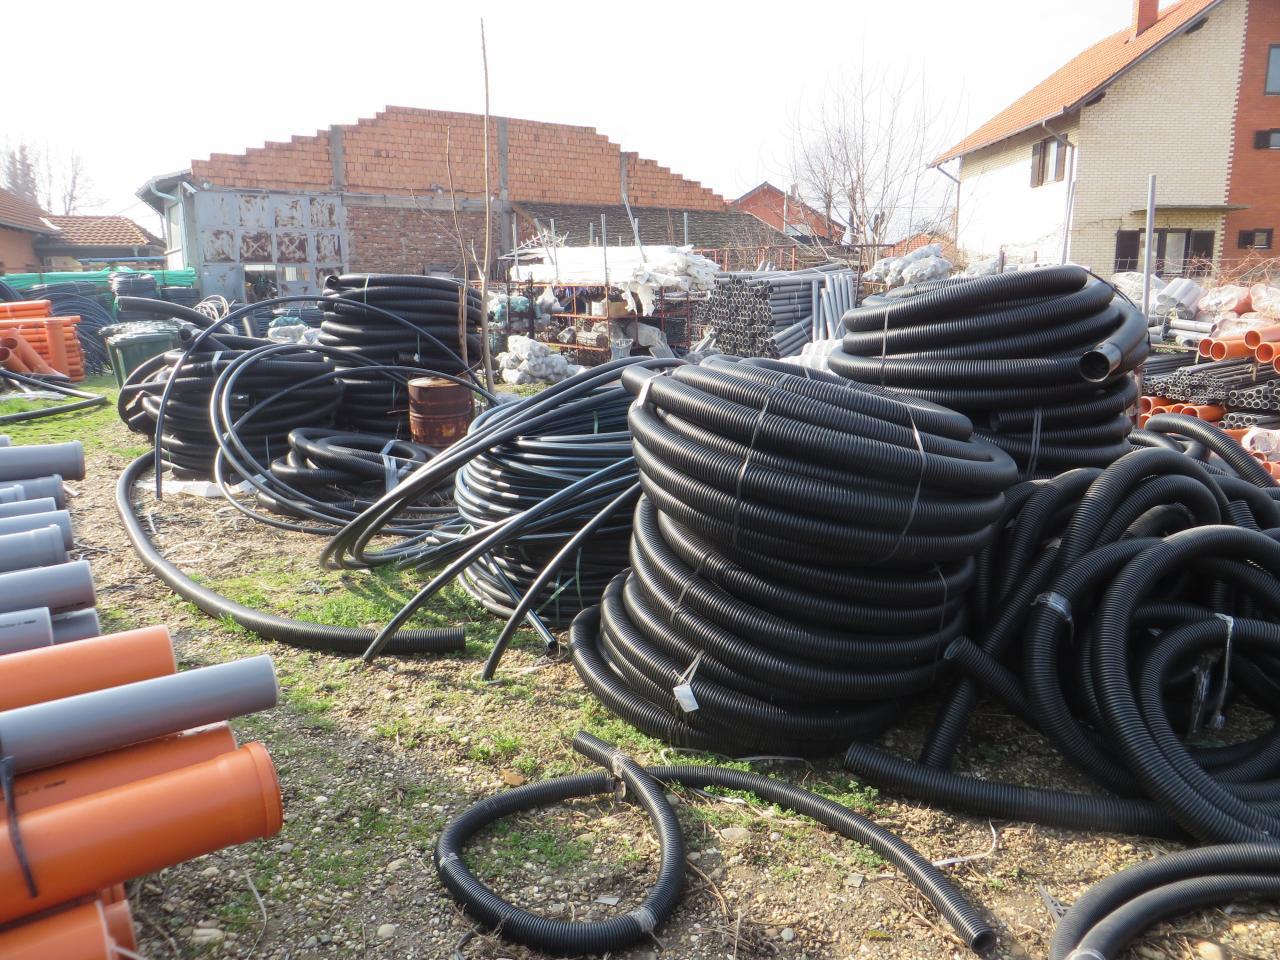 ADRIA KOMERC Vodovod i kanalizacija Požarevac